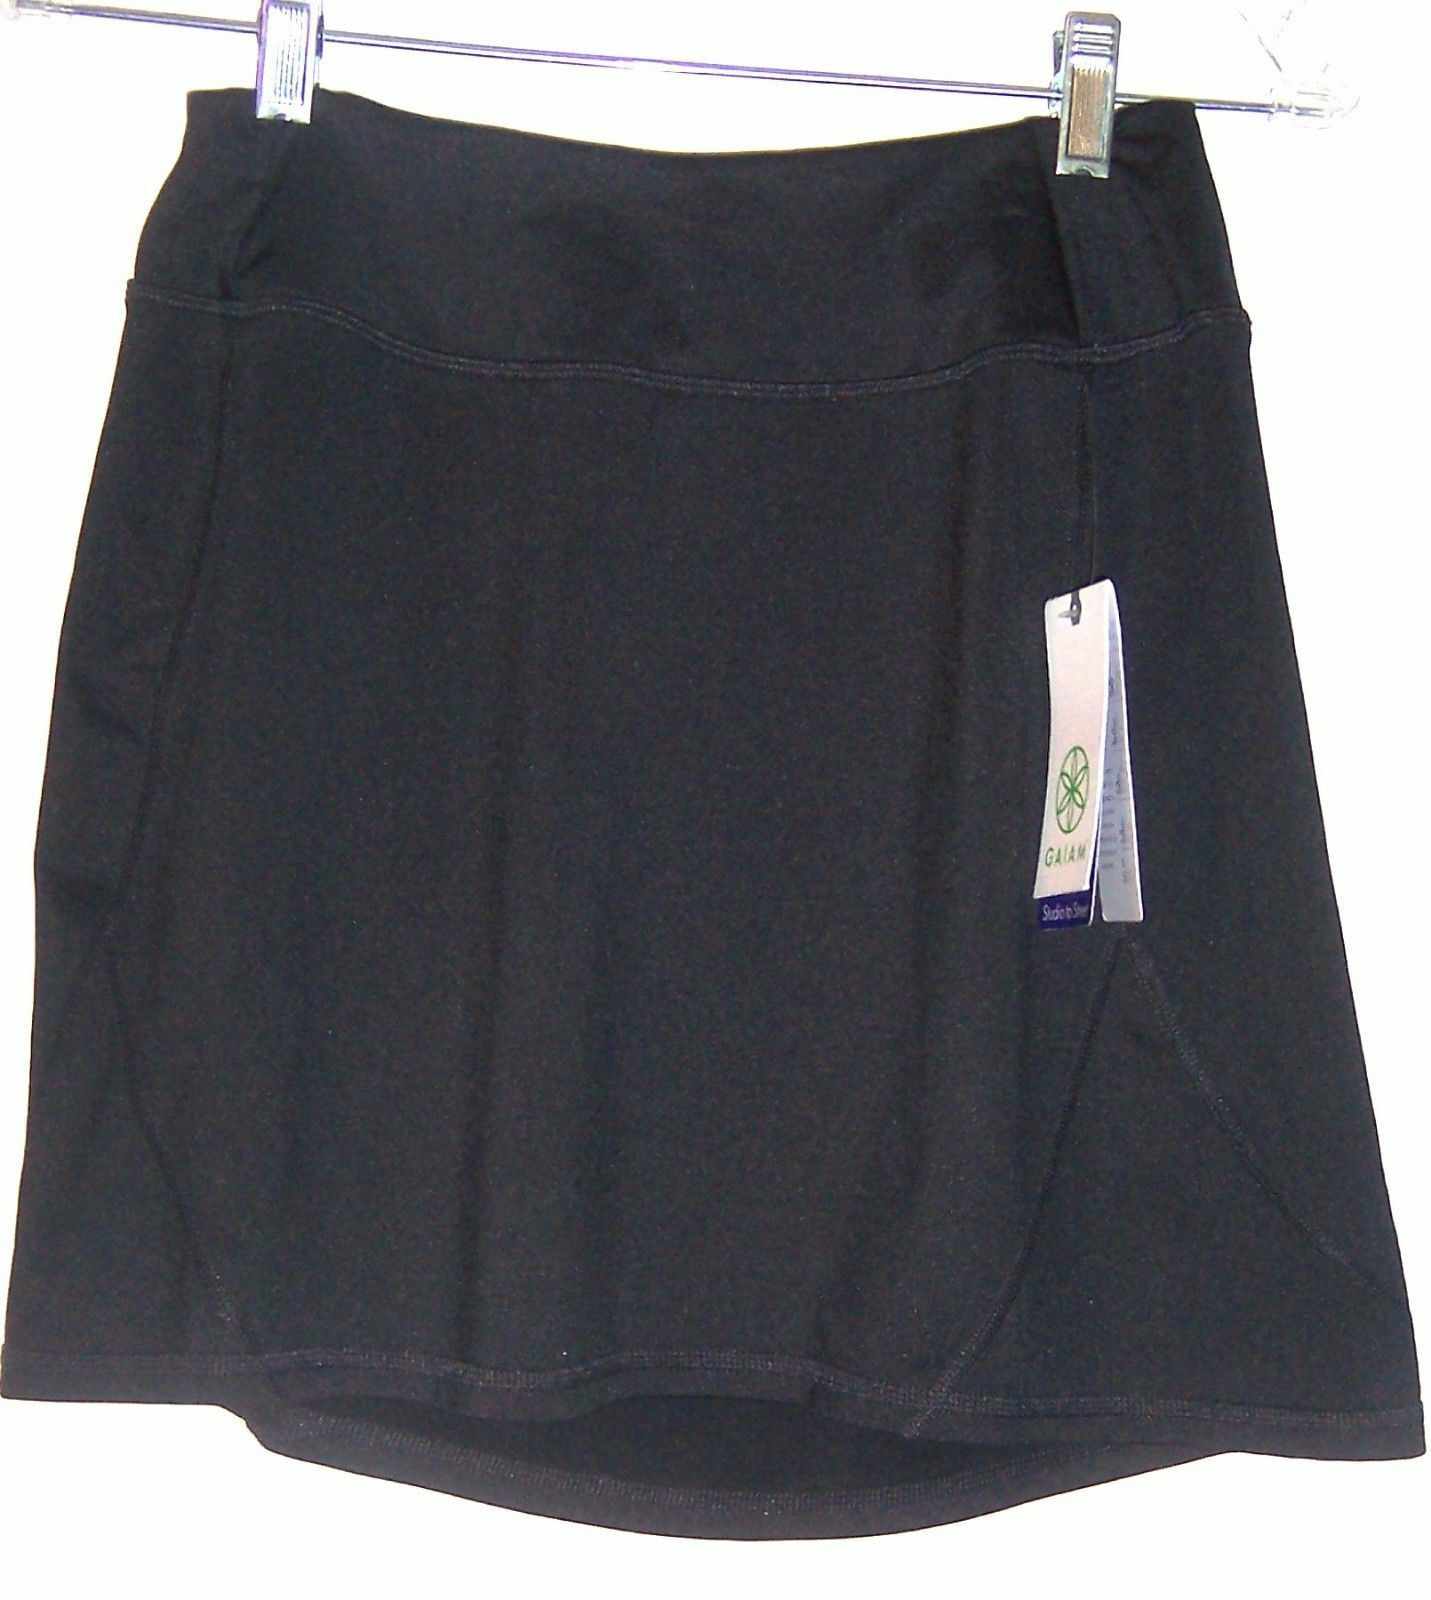 Gaiam Black Refresh Yoga Sports Skirt Athletic Activewear Skirt Size XS - S